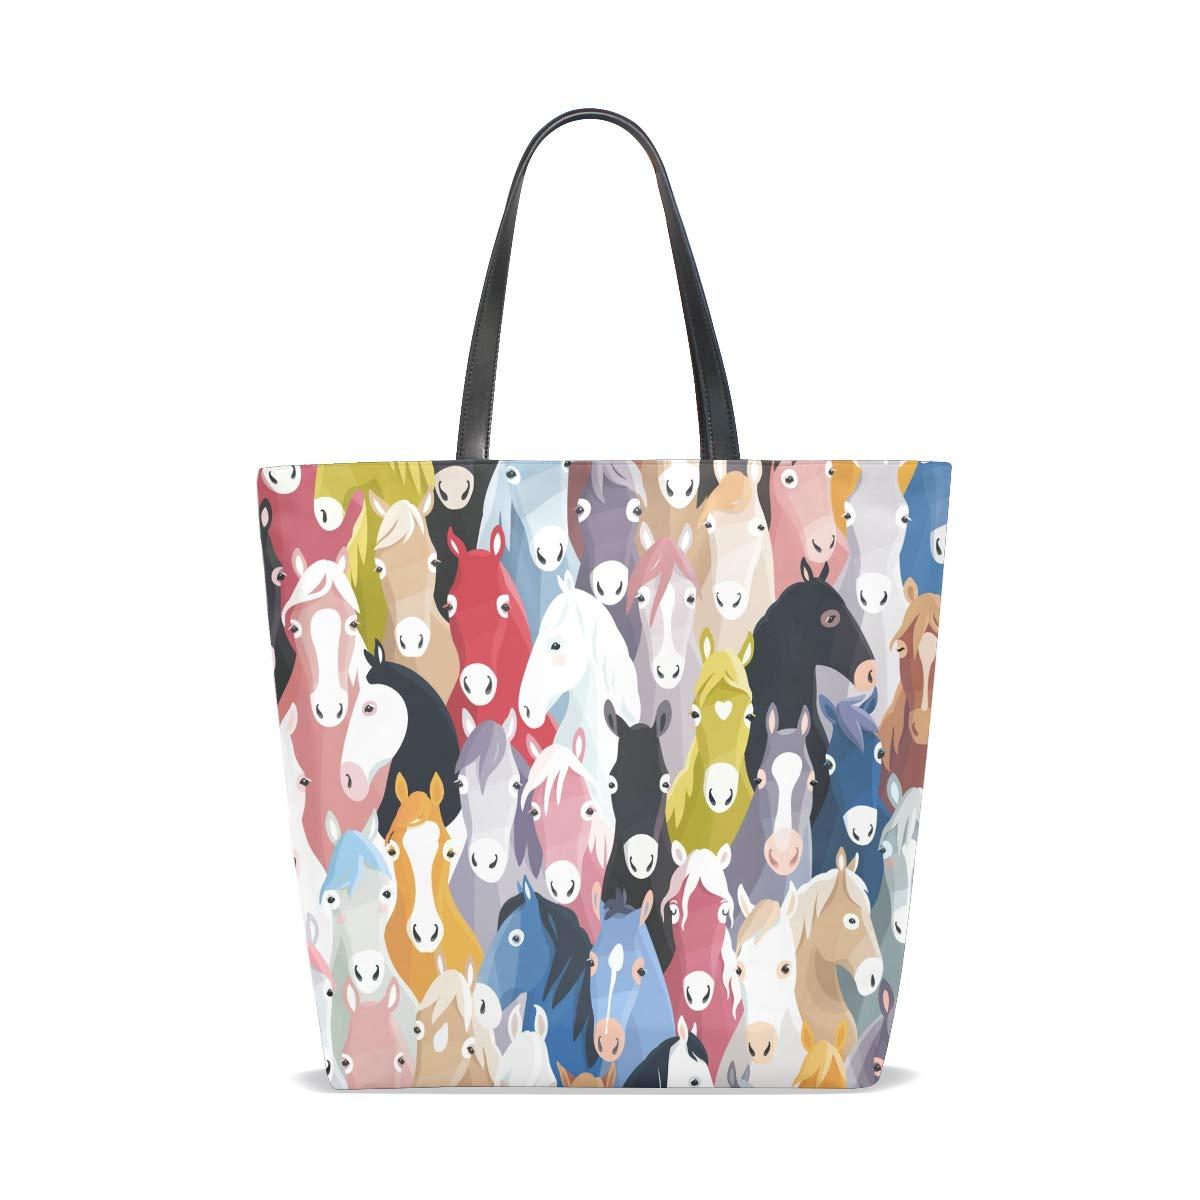 XiangHeFu Femme Sacs /à main mignon color/é Cheval f/ête Tissu Polyester Sac /à bandouli/ère